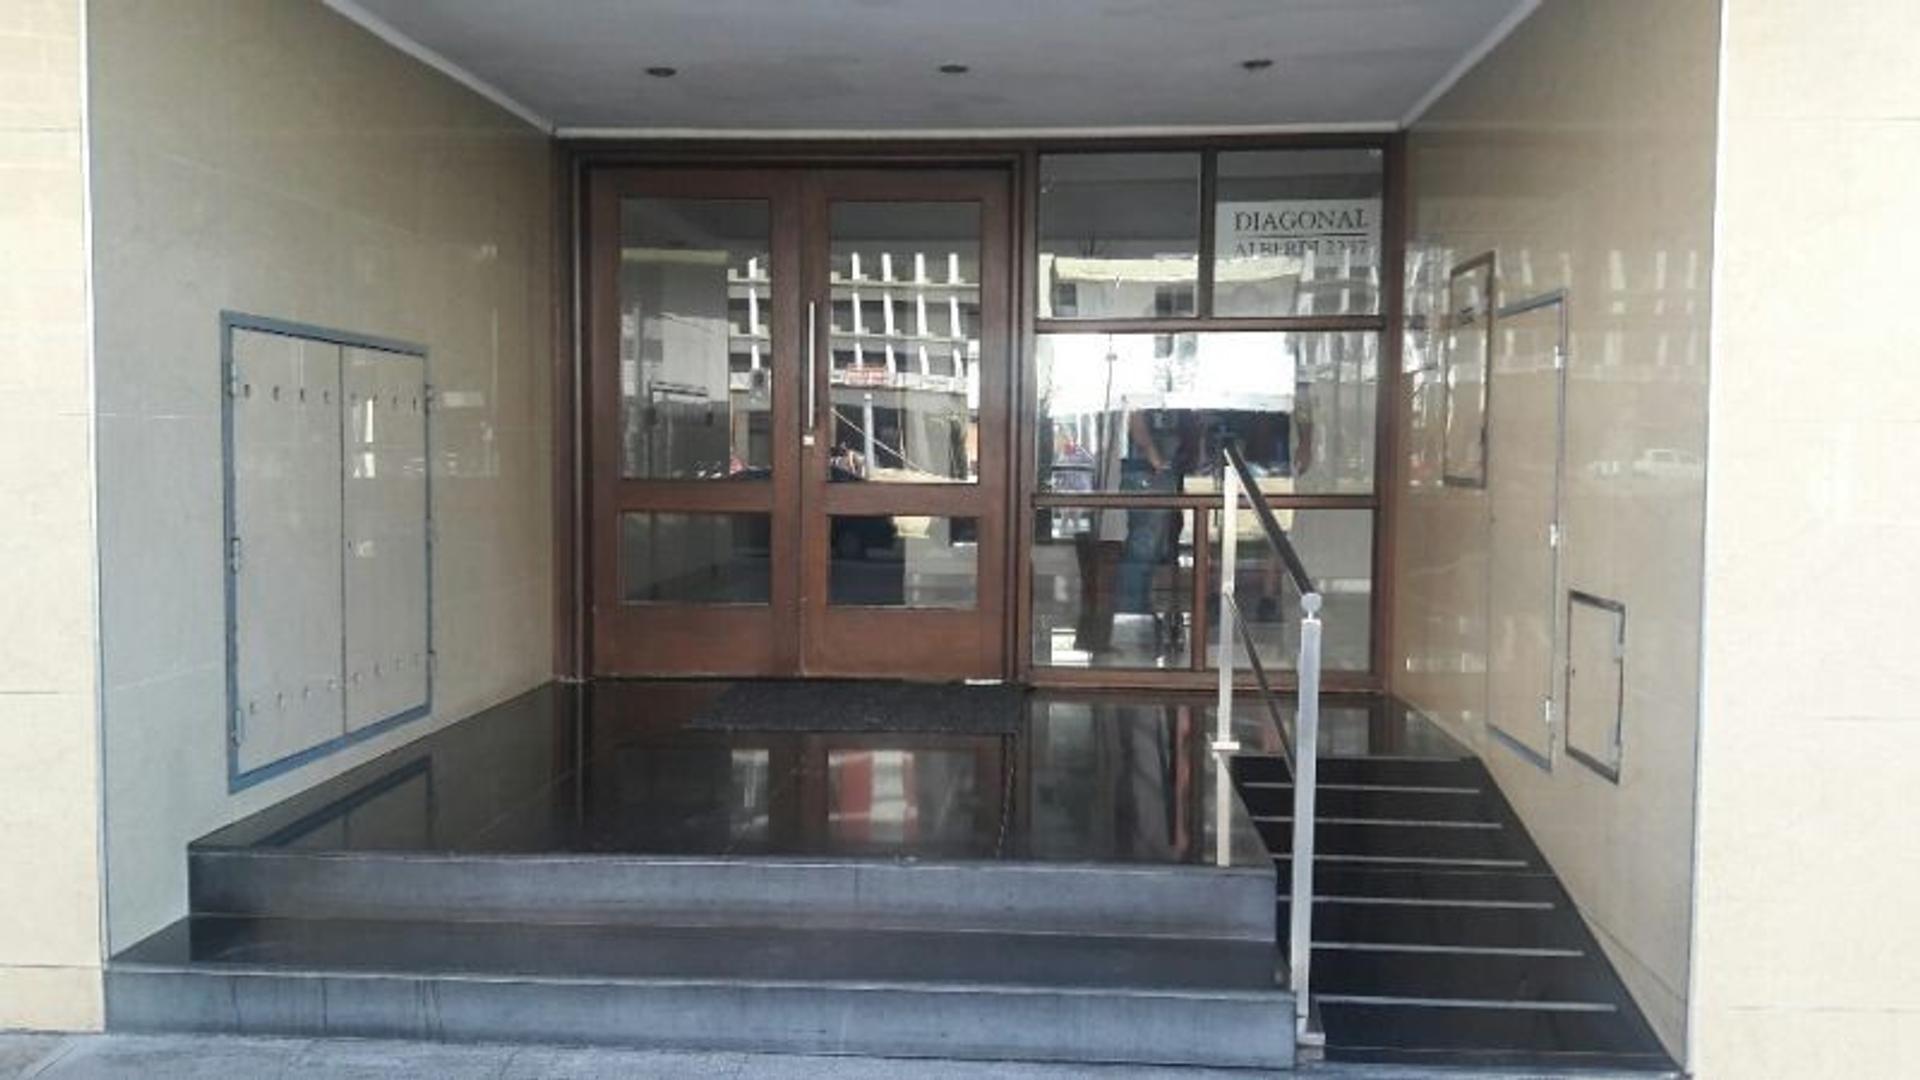 Departamento - Alquiler temporario - Argentina, Mar del Plata - diagonal alberdi norte  AL 2300